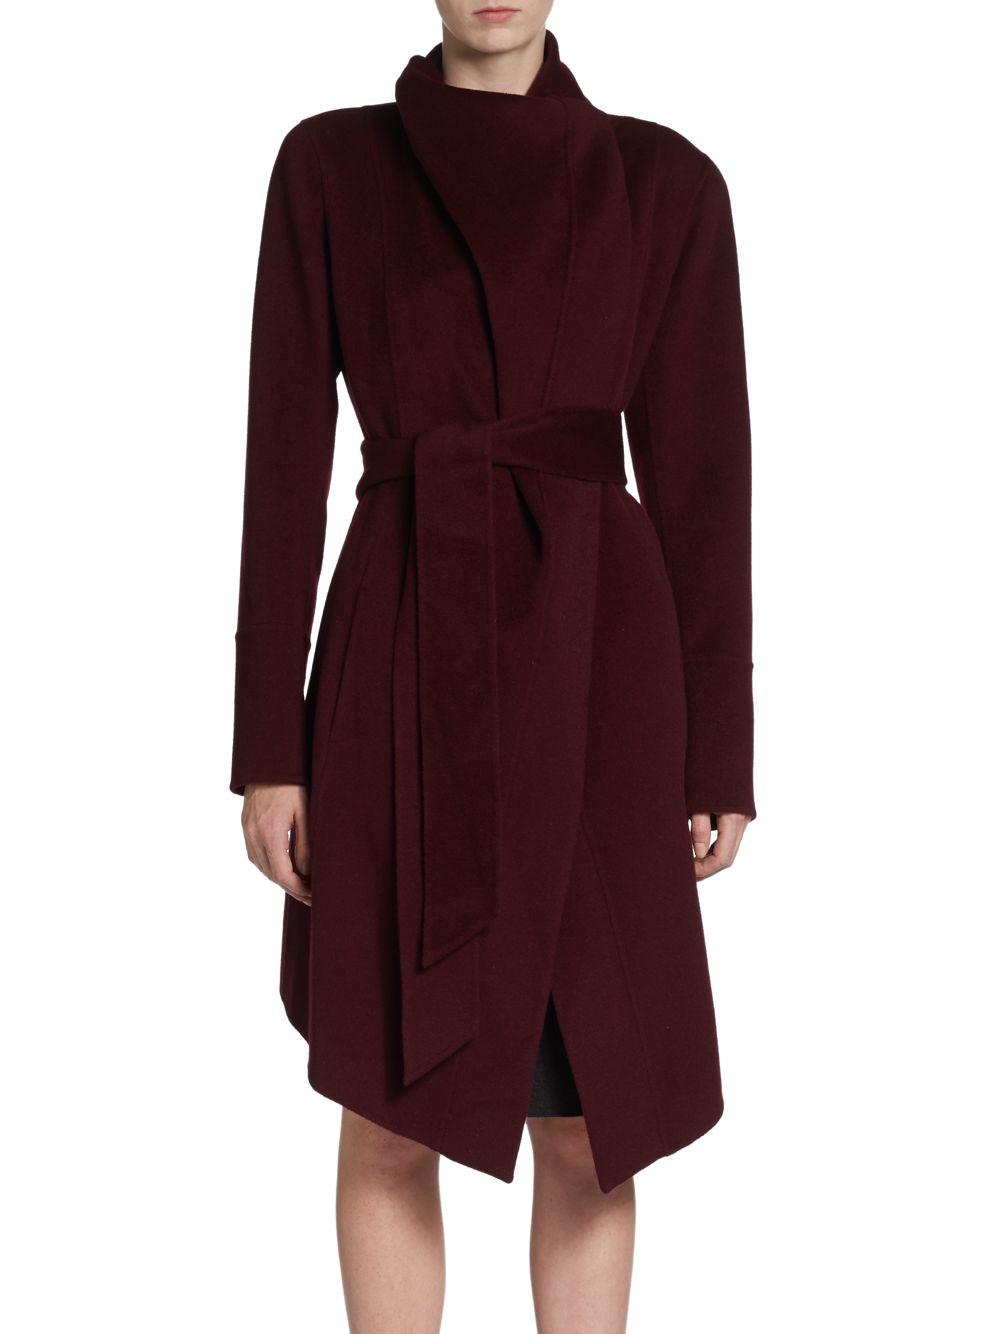 donna karan new york draped cashmere coat in red wine lyst. Black Bedroom Furniture Sets. Home Design Ideas